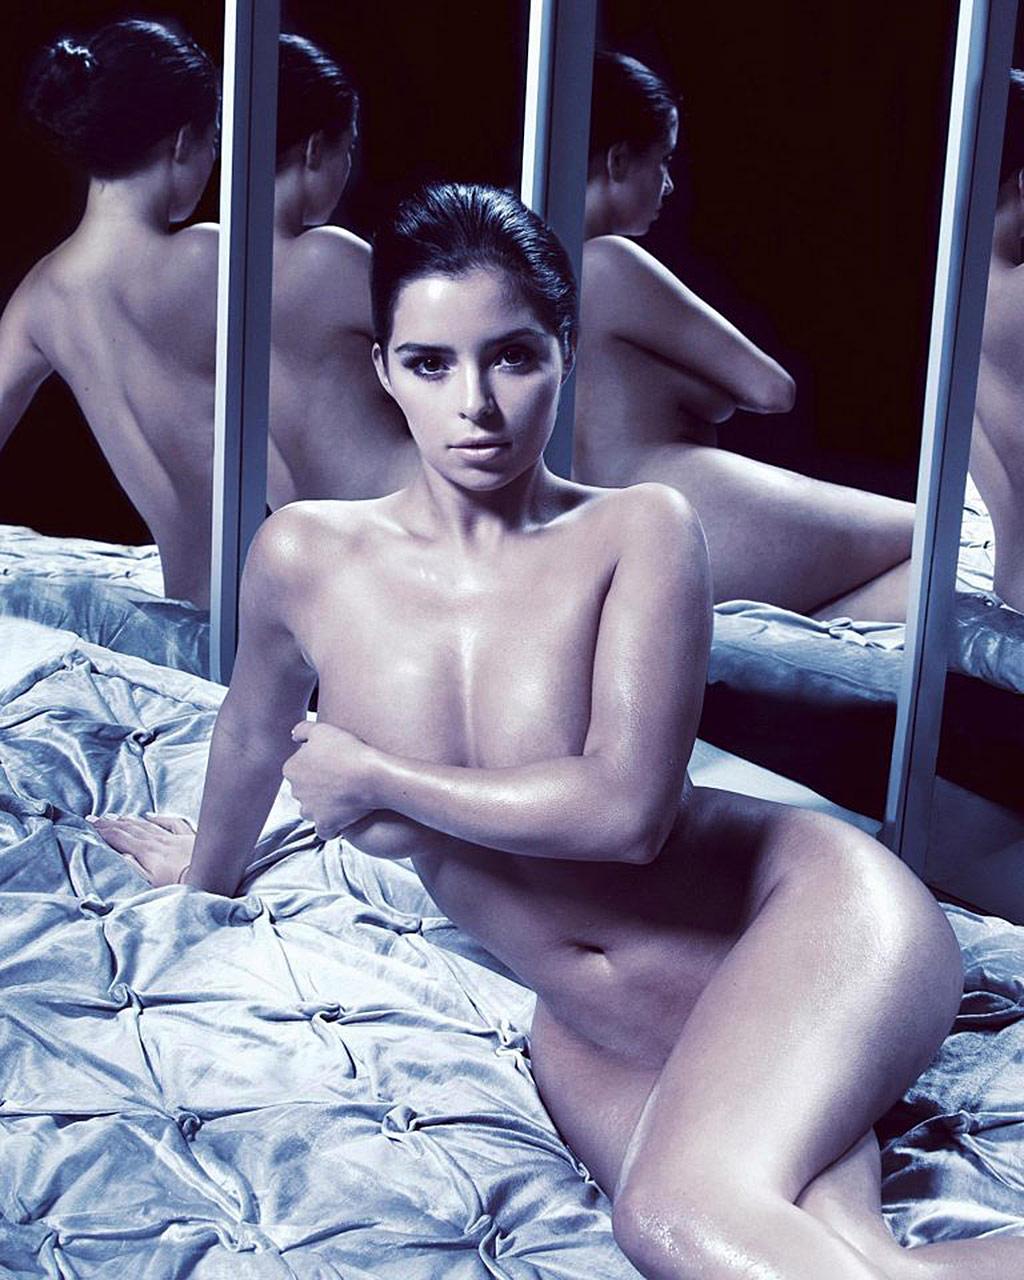 http://scandalplanet.com/wp-content/uploads/2017/12/06-Demi-Rose-Mawby-Nude.jpg